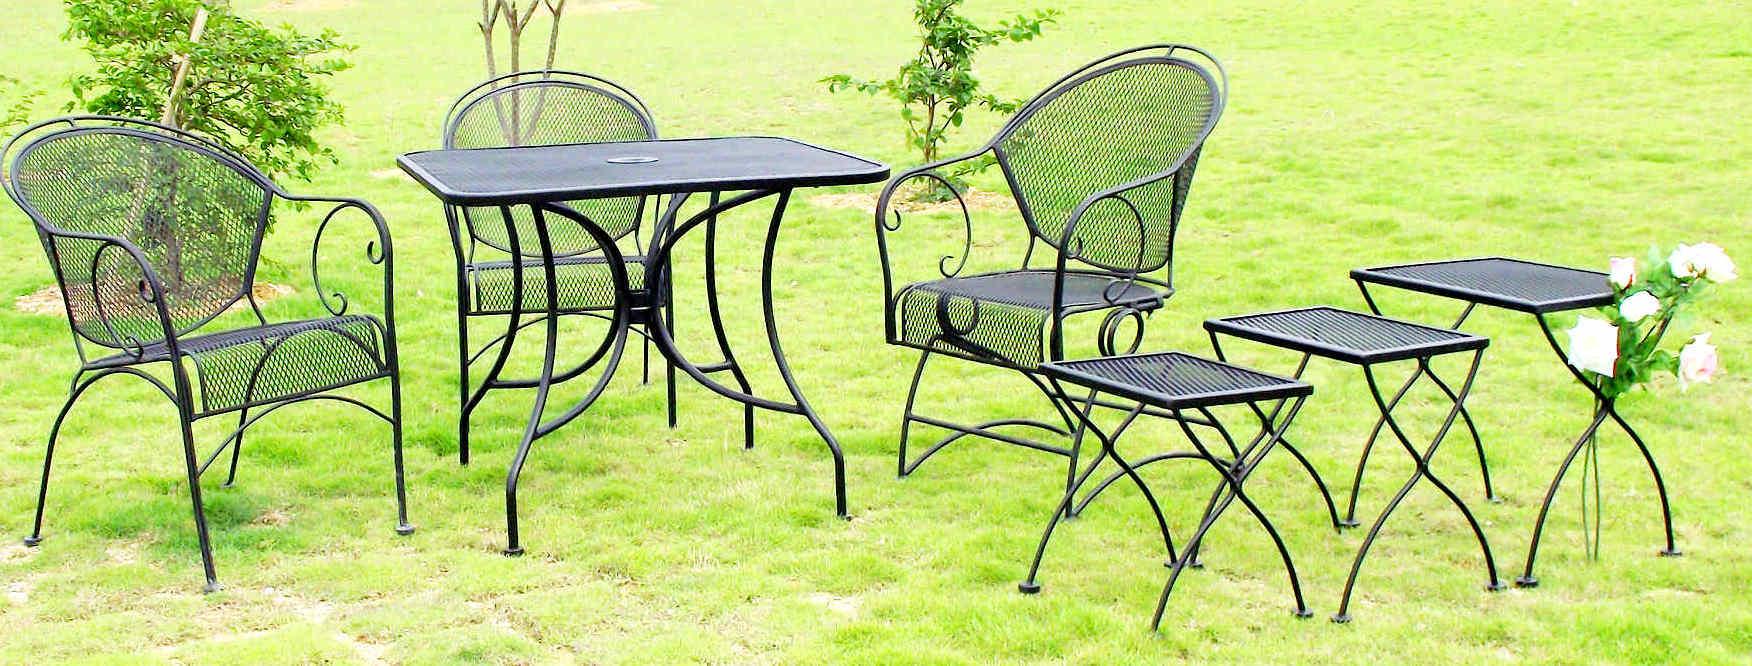 China Patio Furniture Mesh Table & Mesh Chair SV CHA212 21 SQ 91 SV C